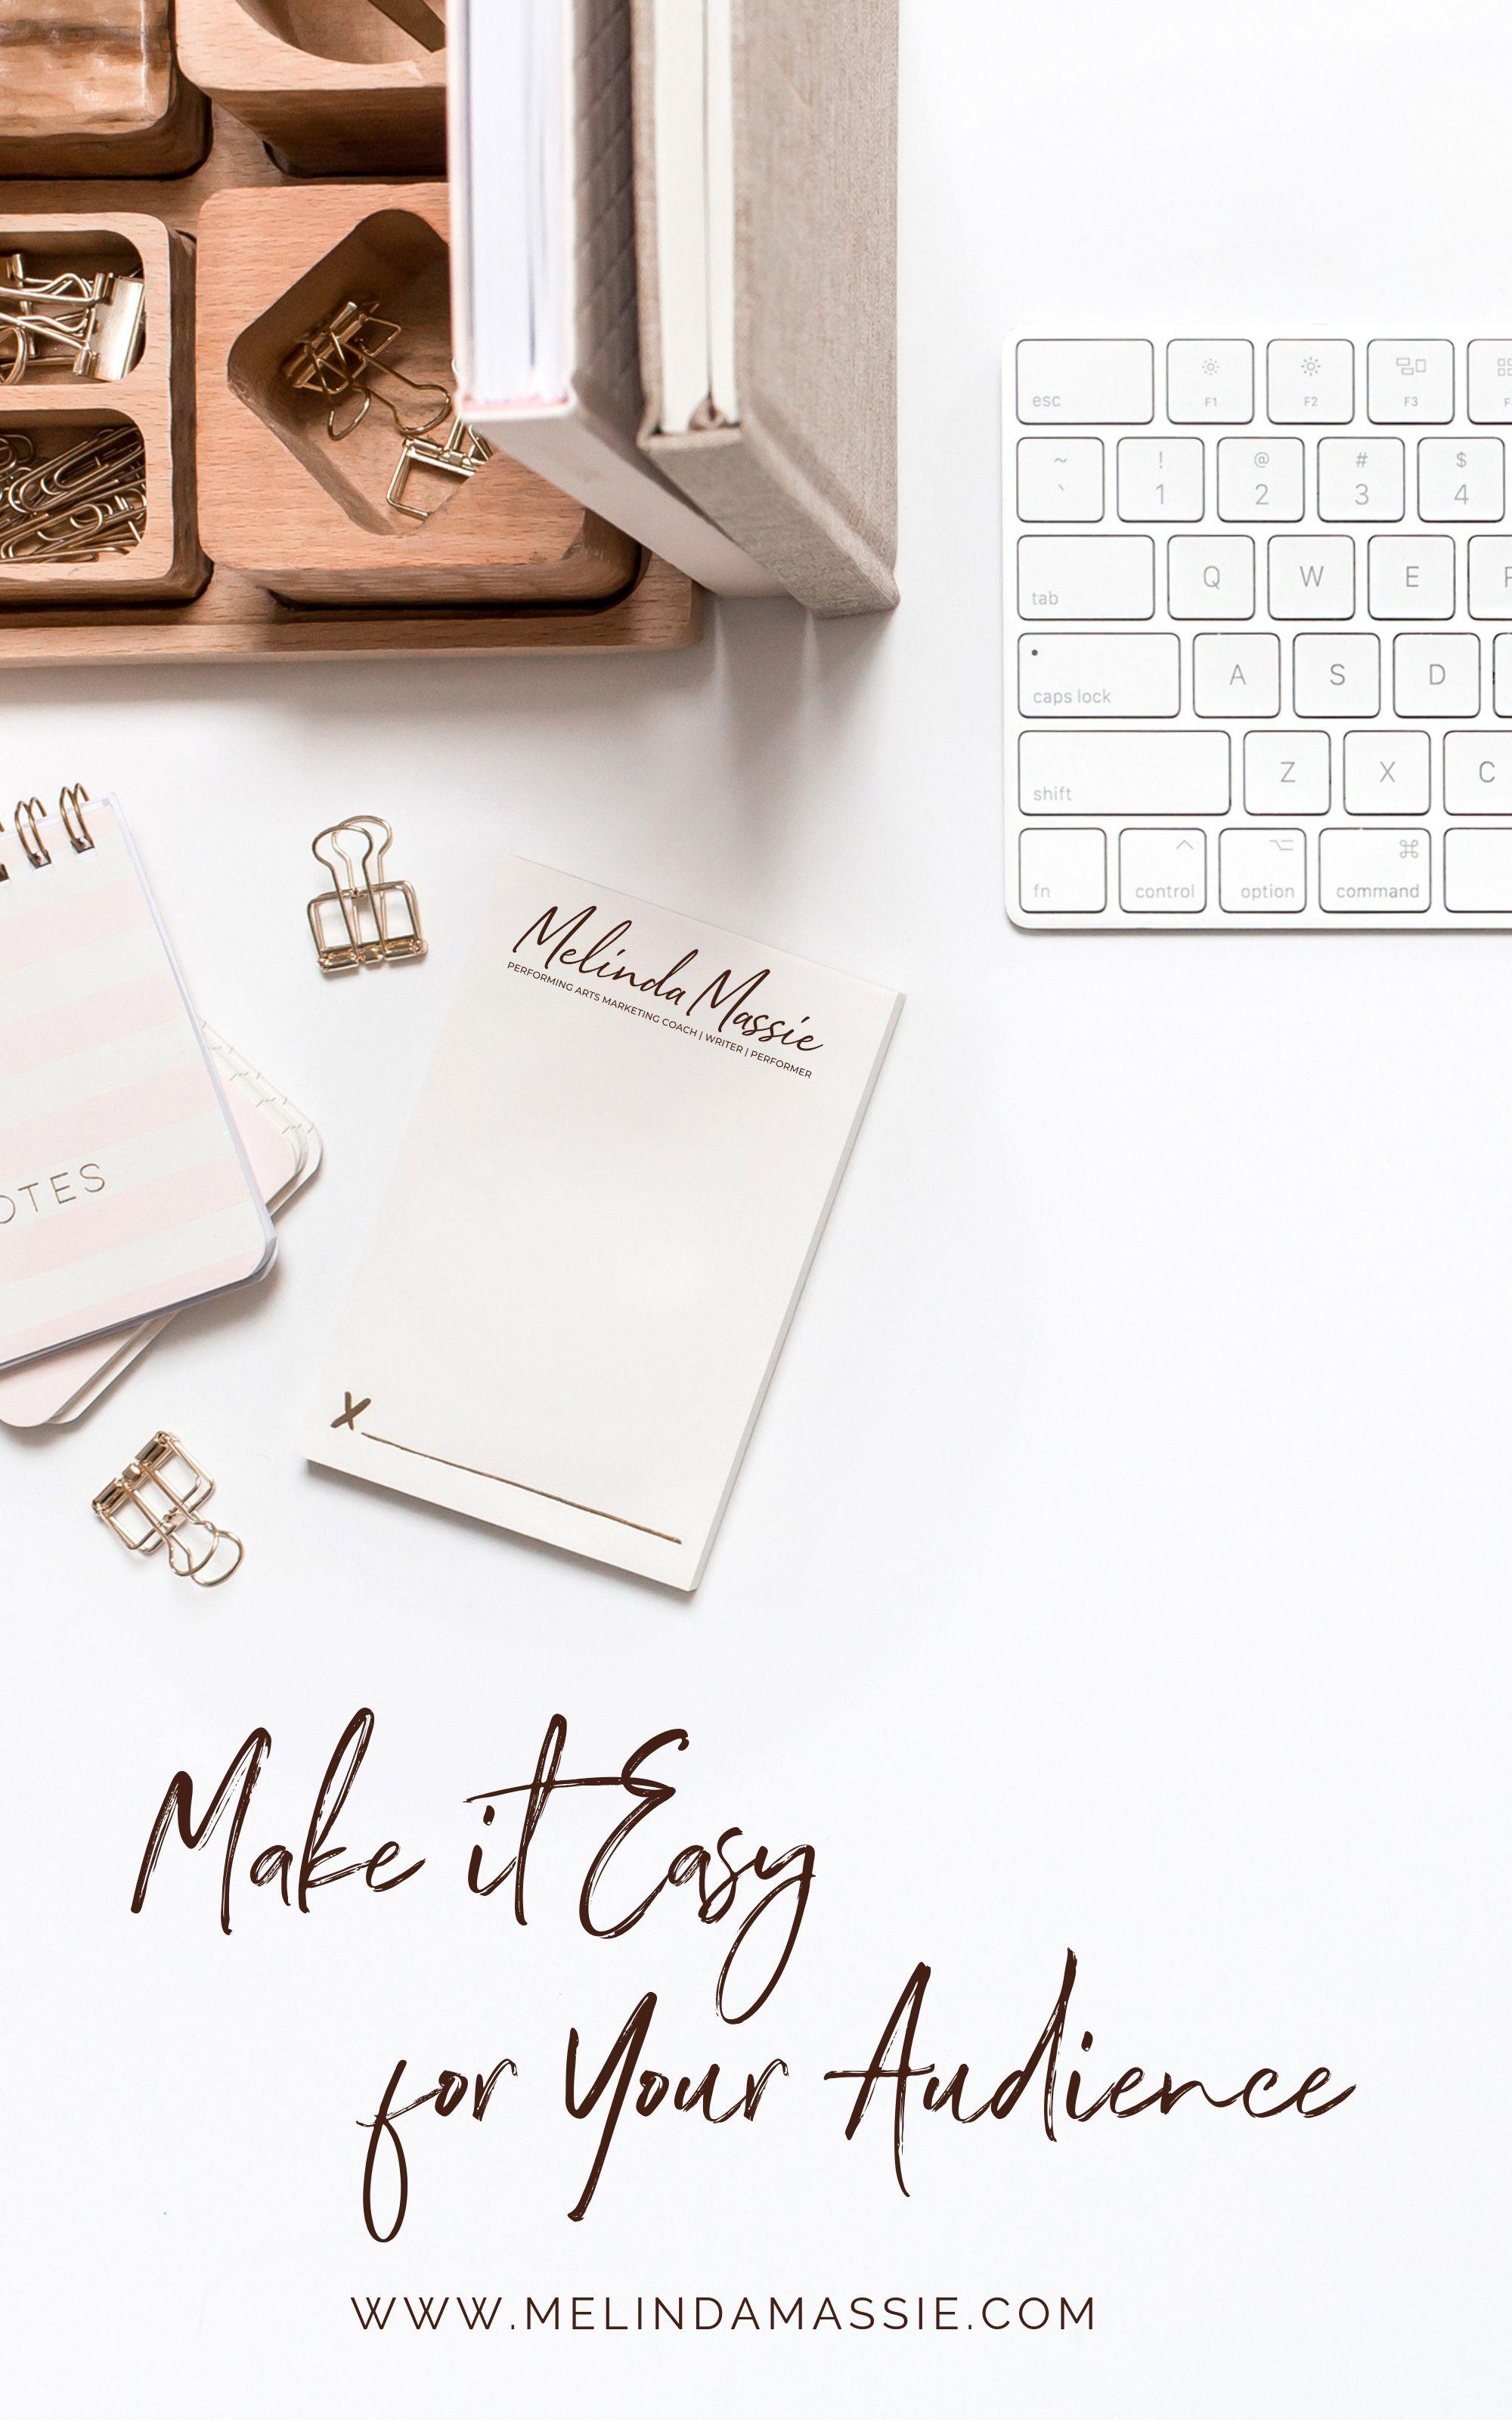 Make it Easy for your Audience - Melinda Massie Marketing blog